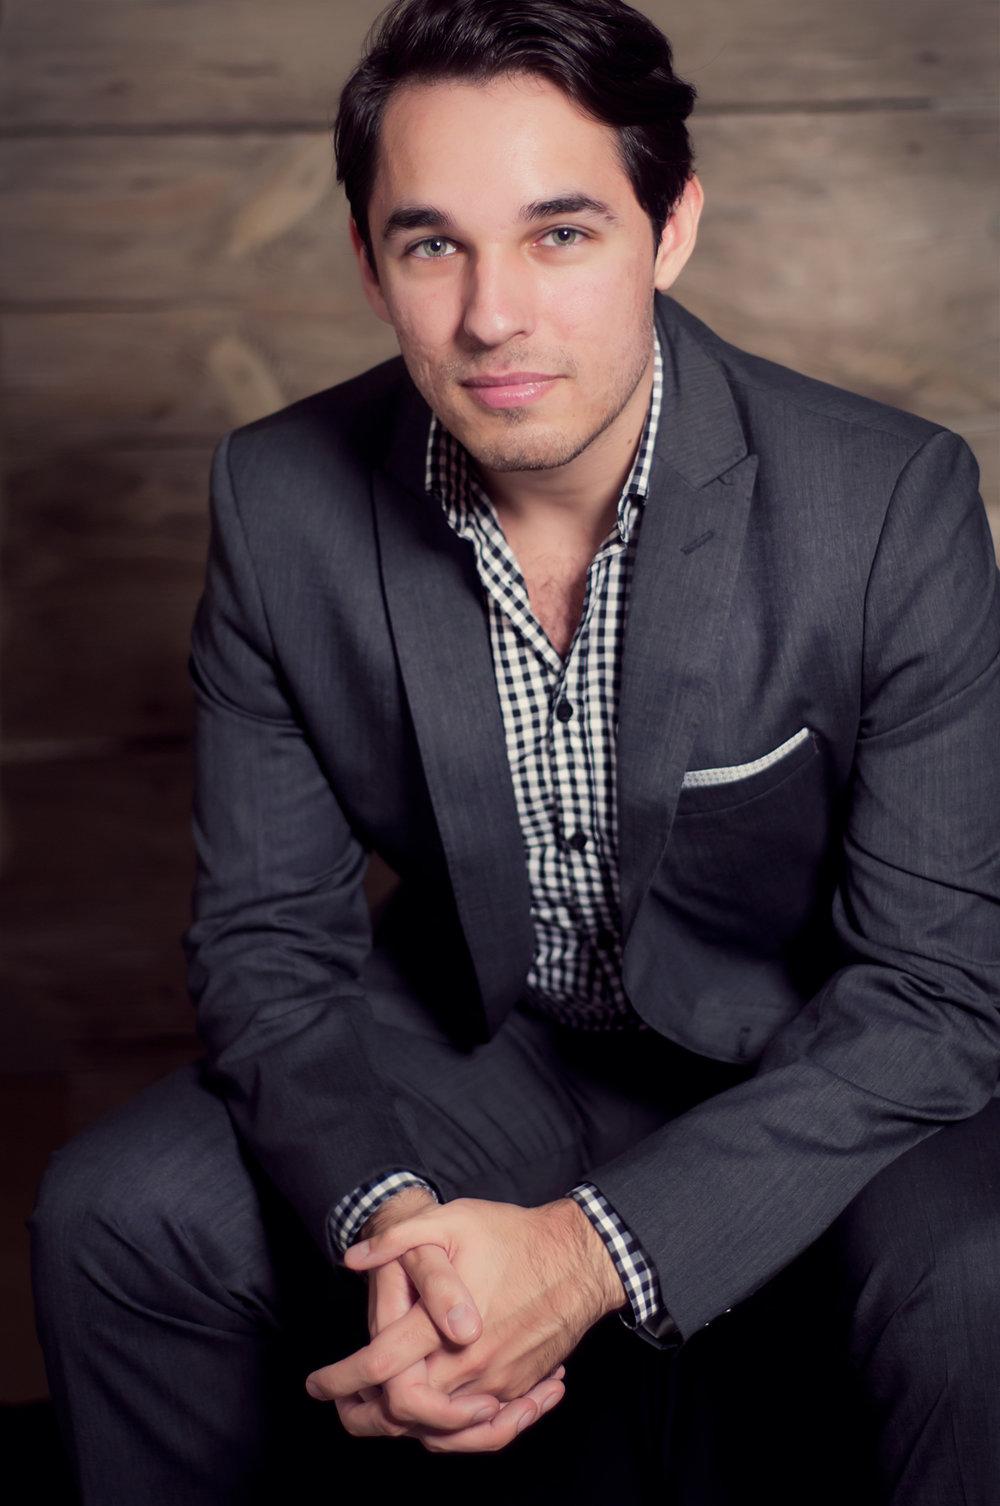 Ian M. Ellis is an Architect and project manager at Matt Fajkus Architecturein Austin, TX. -